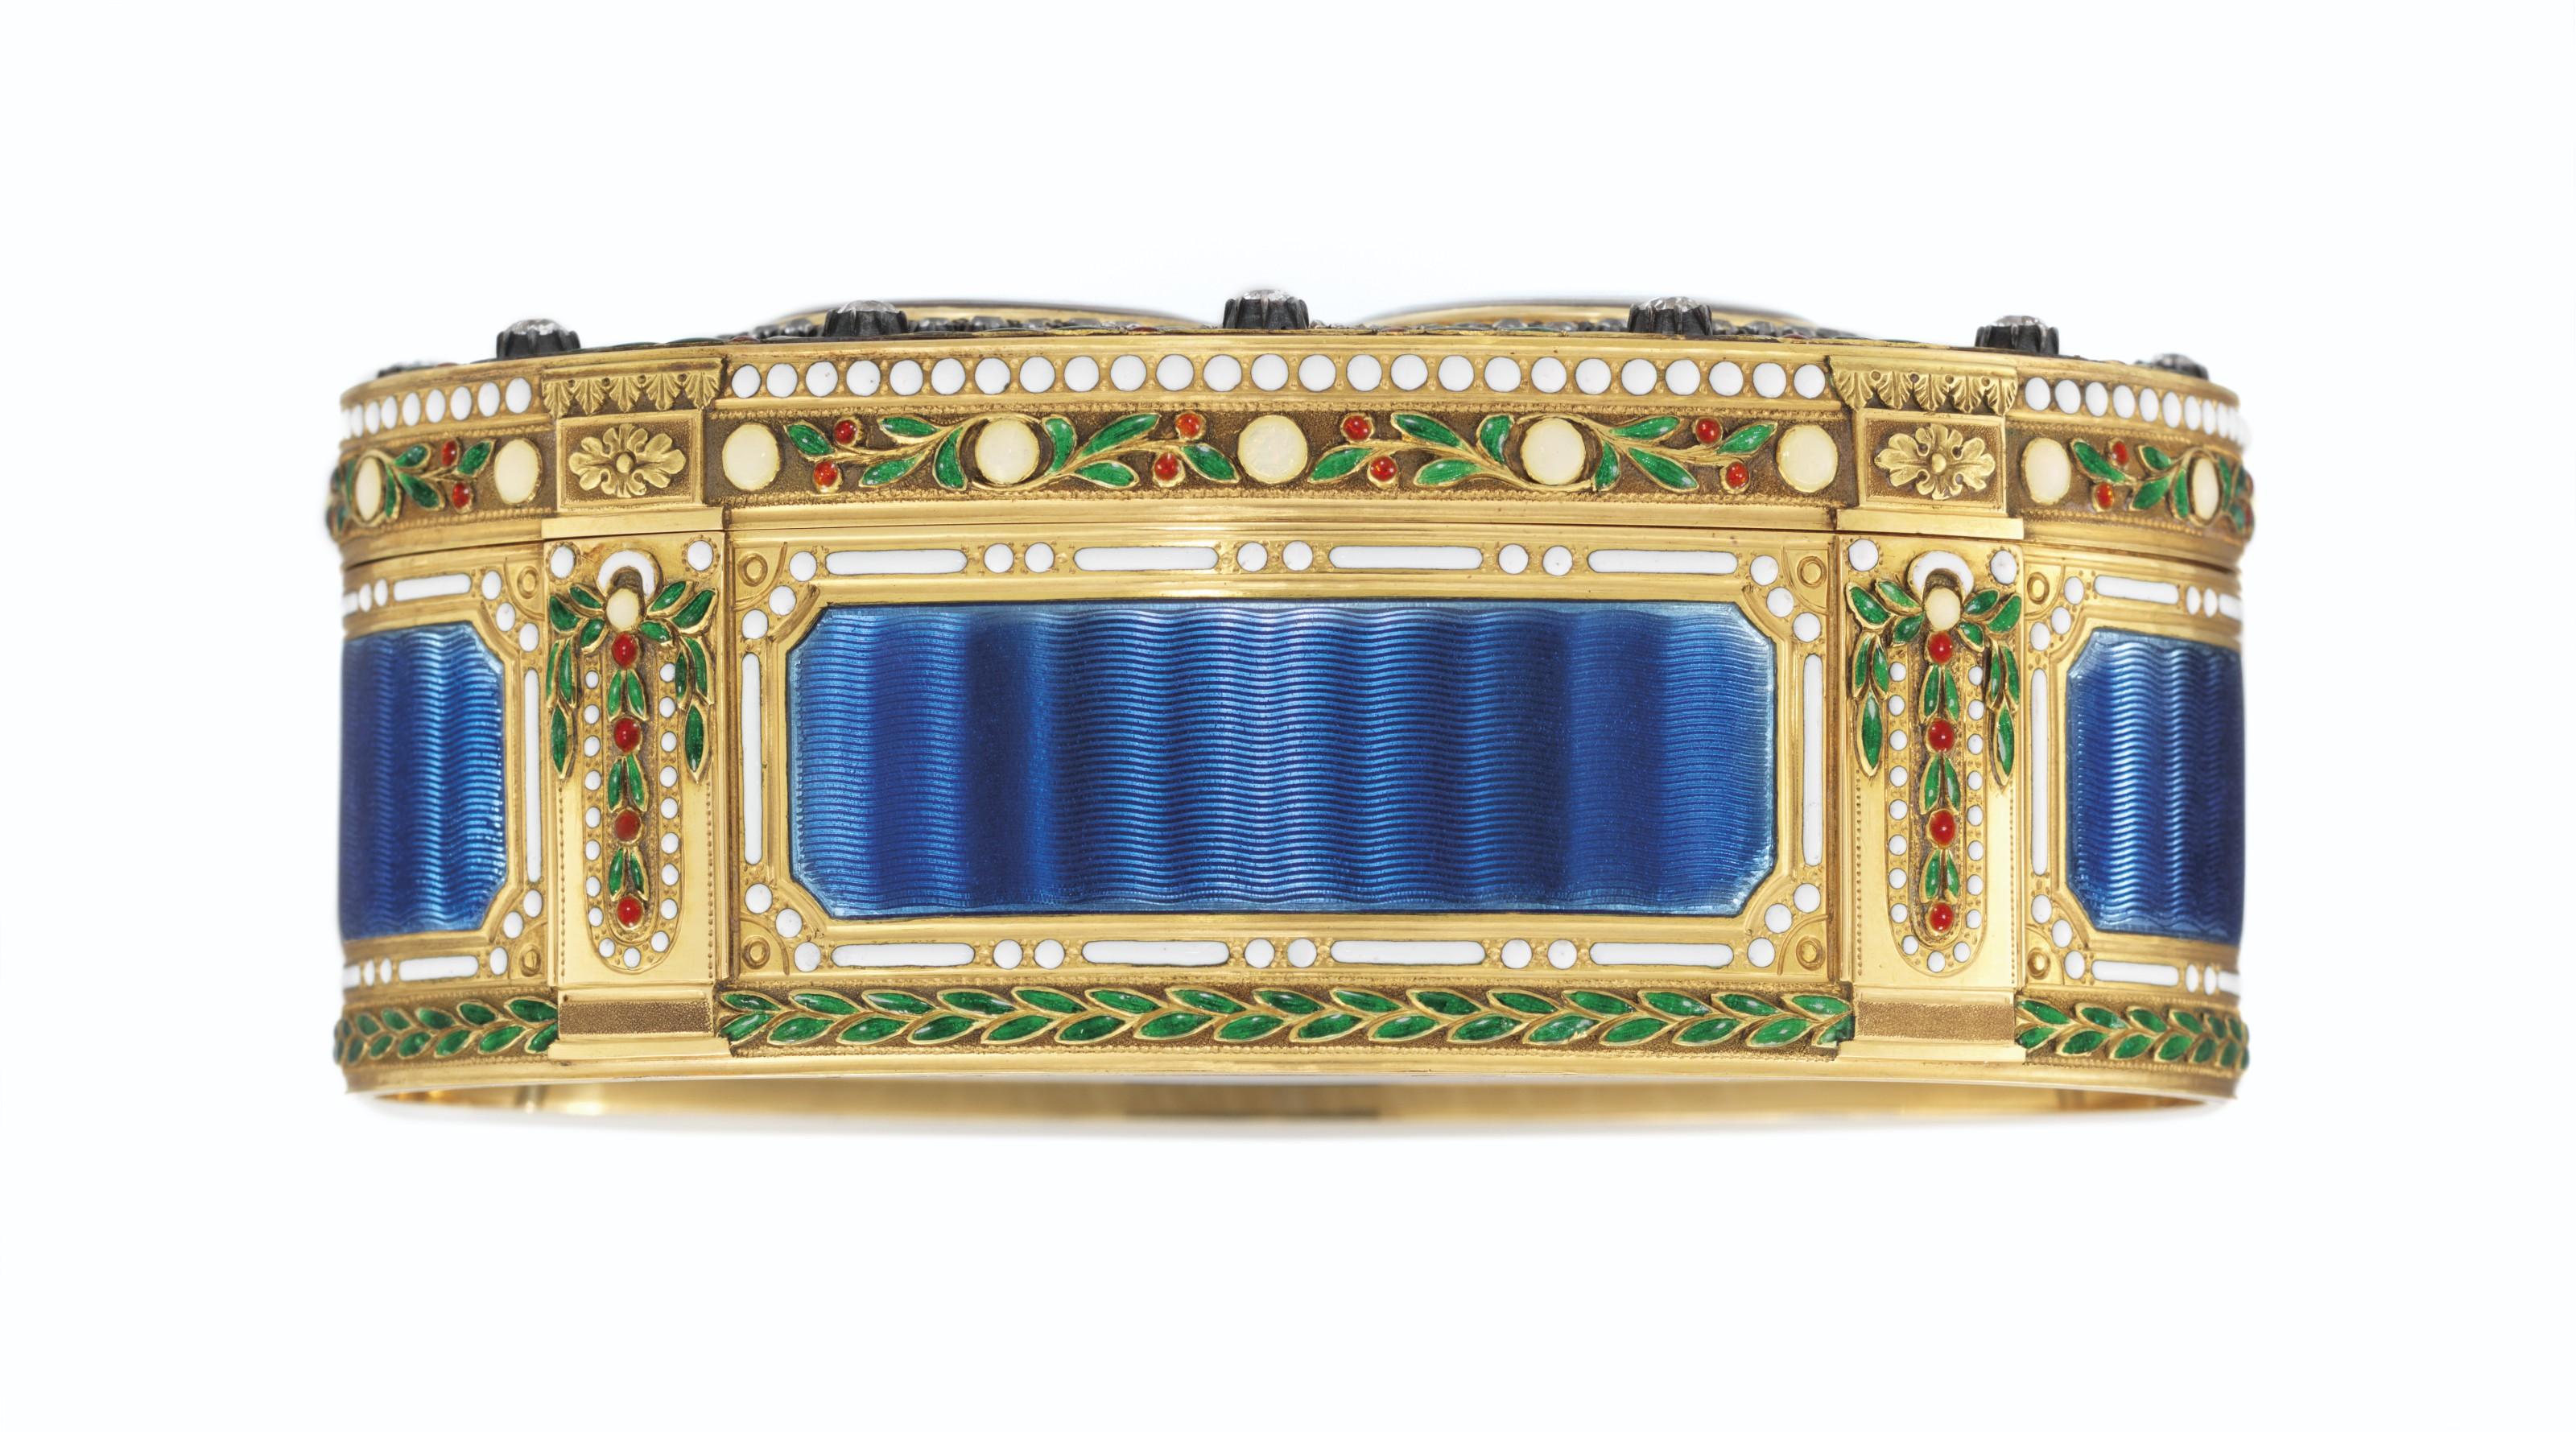 A GEORGE V JEWELLED ENAMELLED GOLD ROYAL PRESENTATION SNUFF-BOX